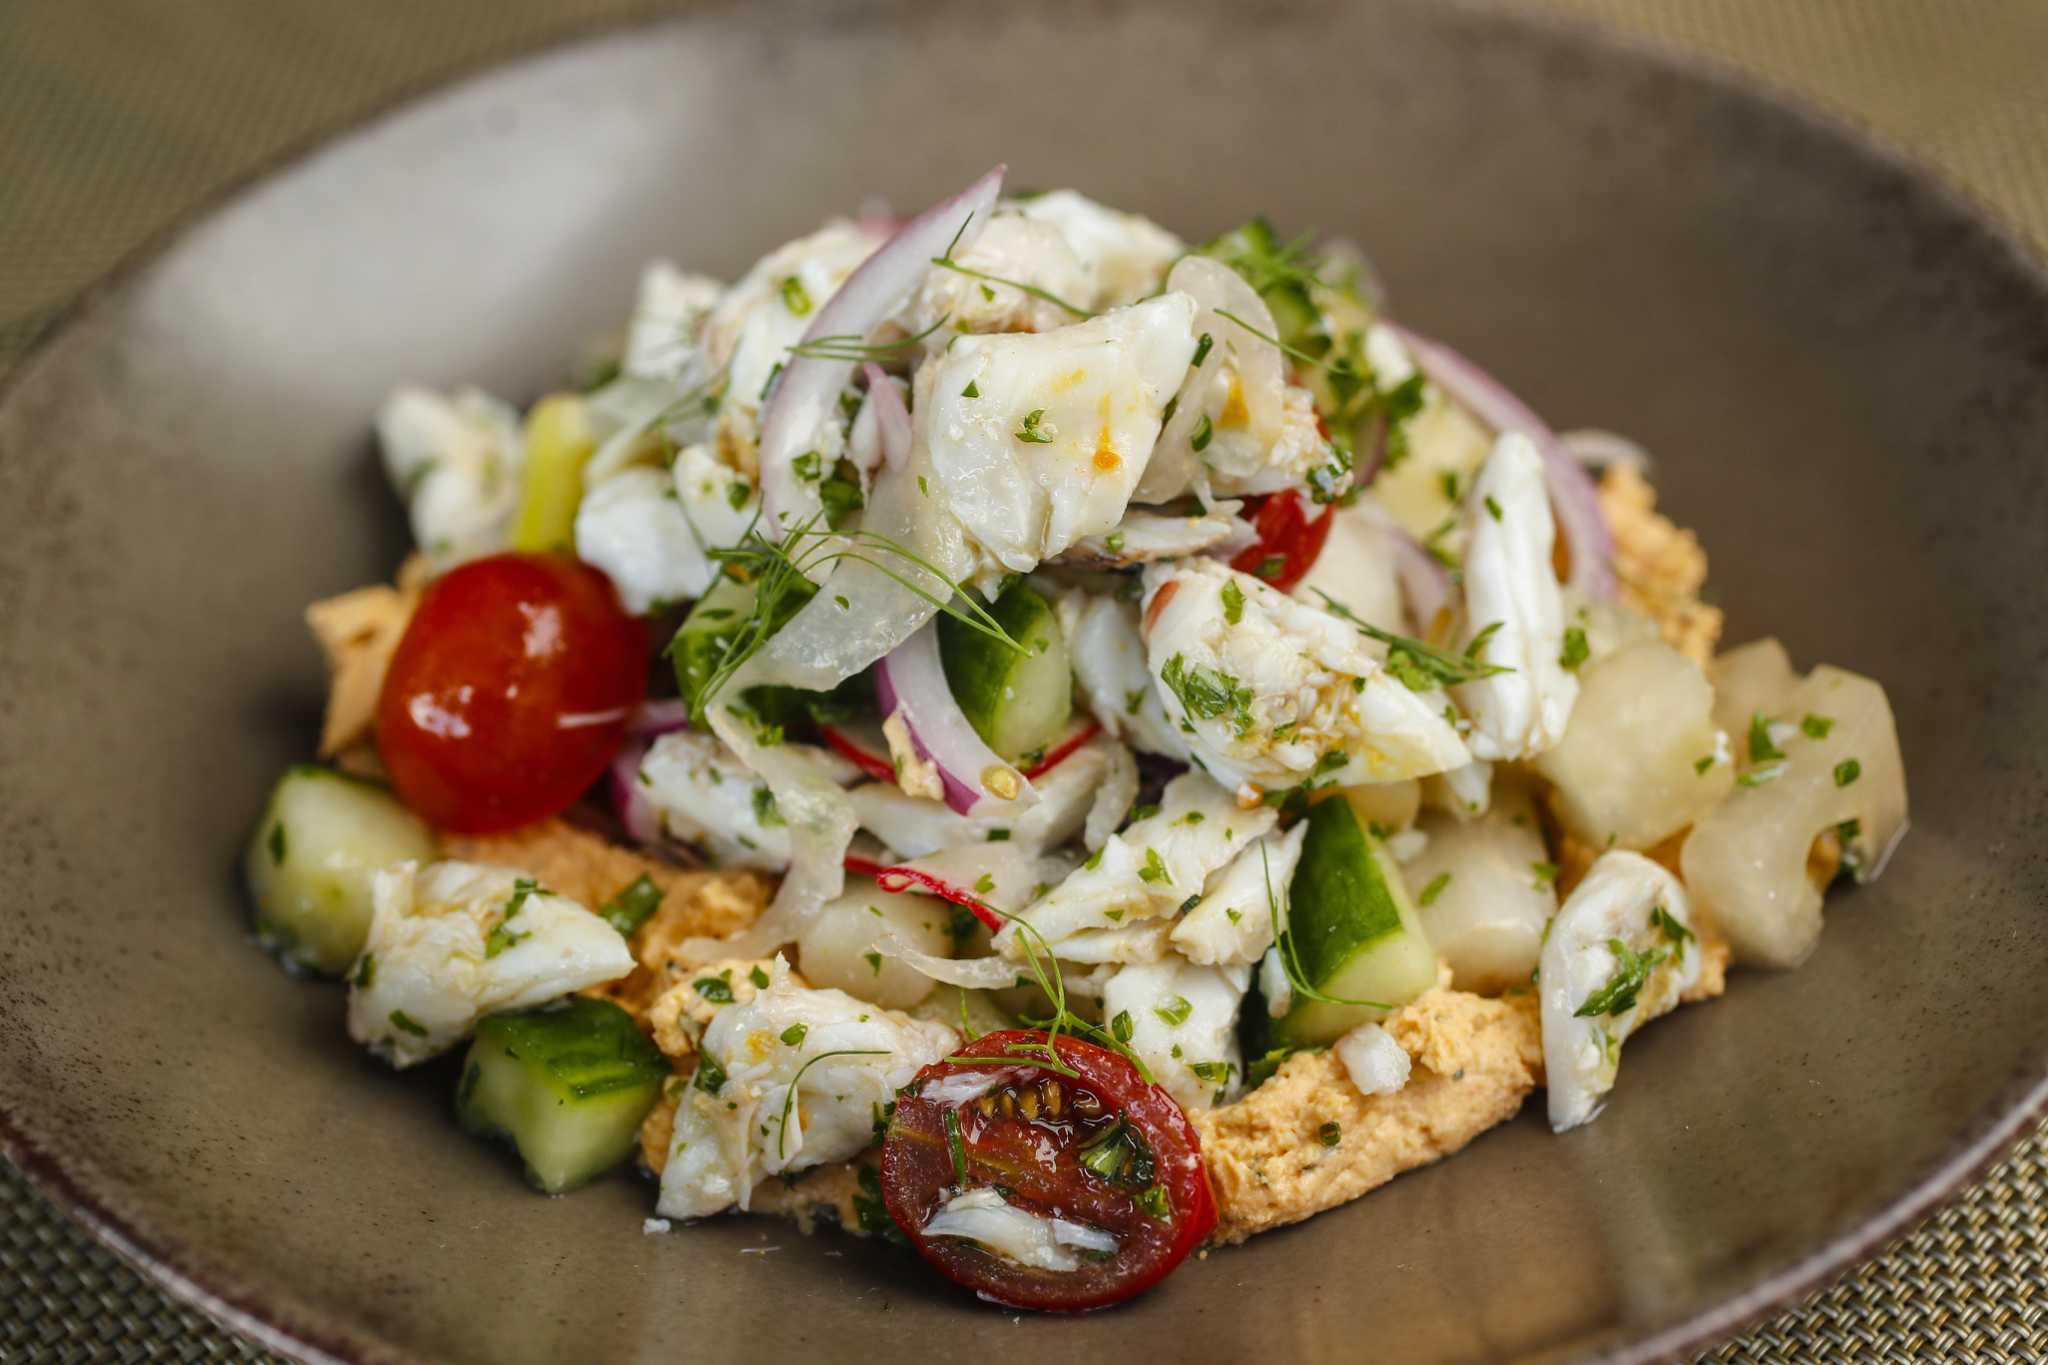 Restaurant review: 1751 Sea & Bar on Heights Boulevard